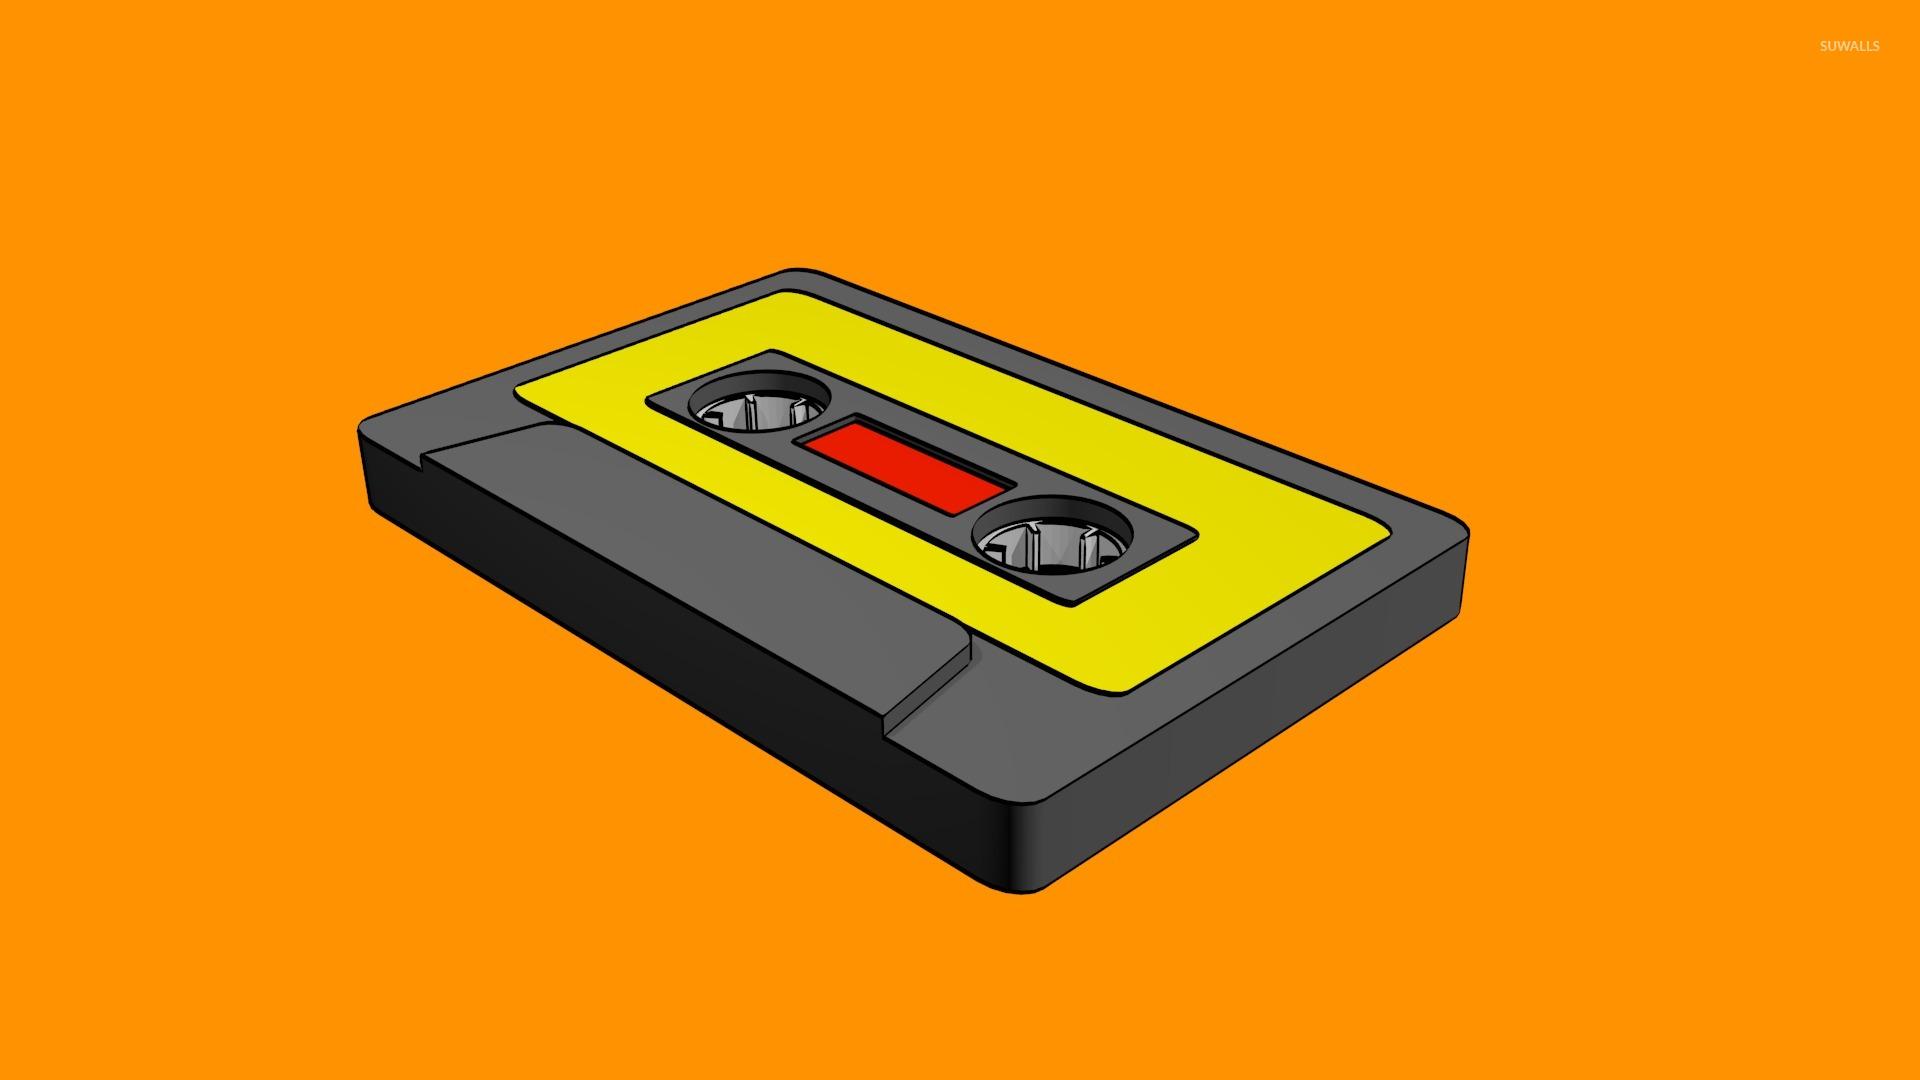 Cassette Tape Wallpaper Vector Wallpapers 41988 HD Wallpapers Download Free Images Wallpaper [1000image.com]